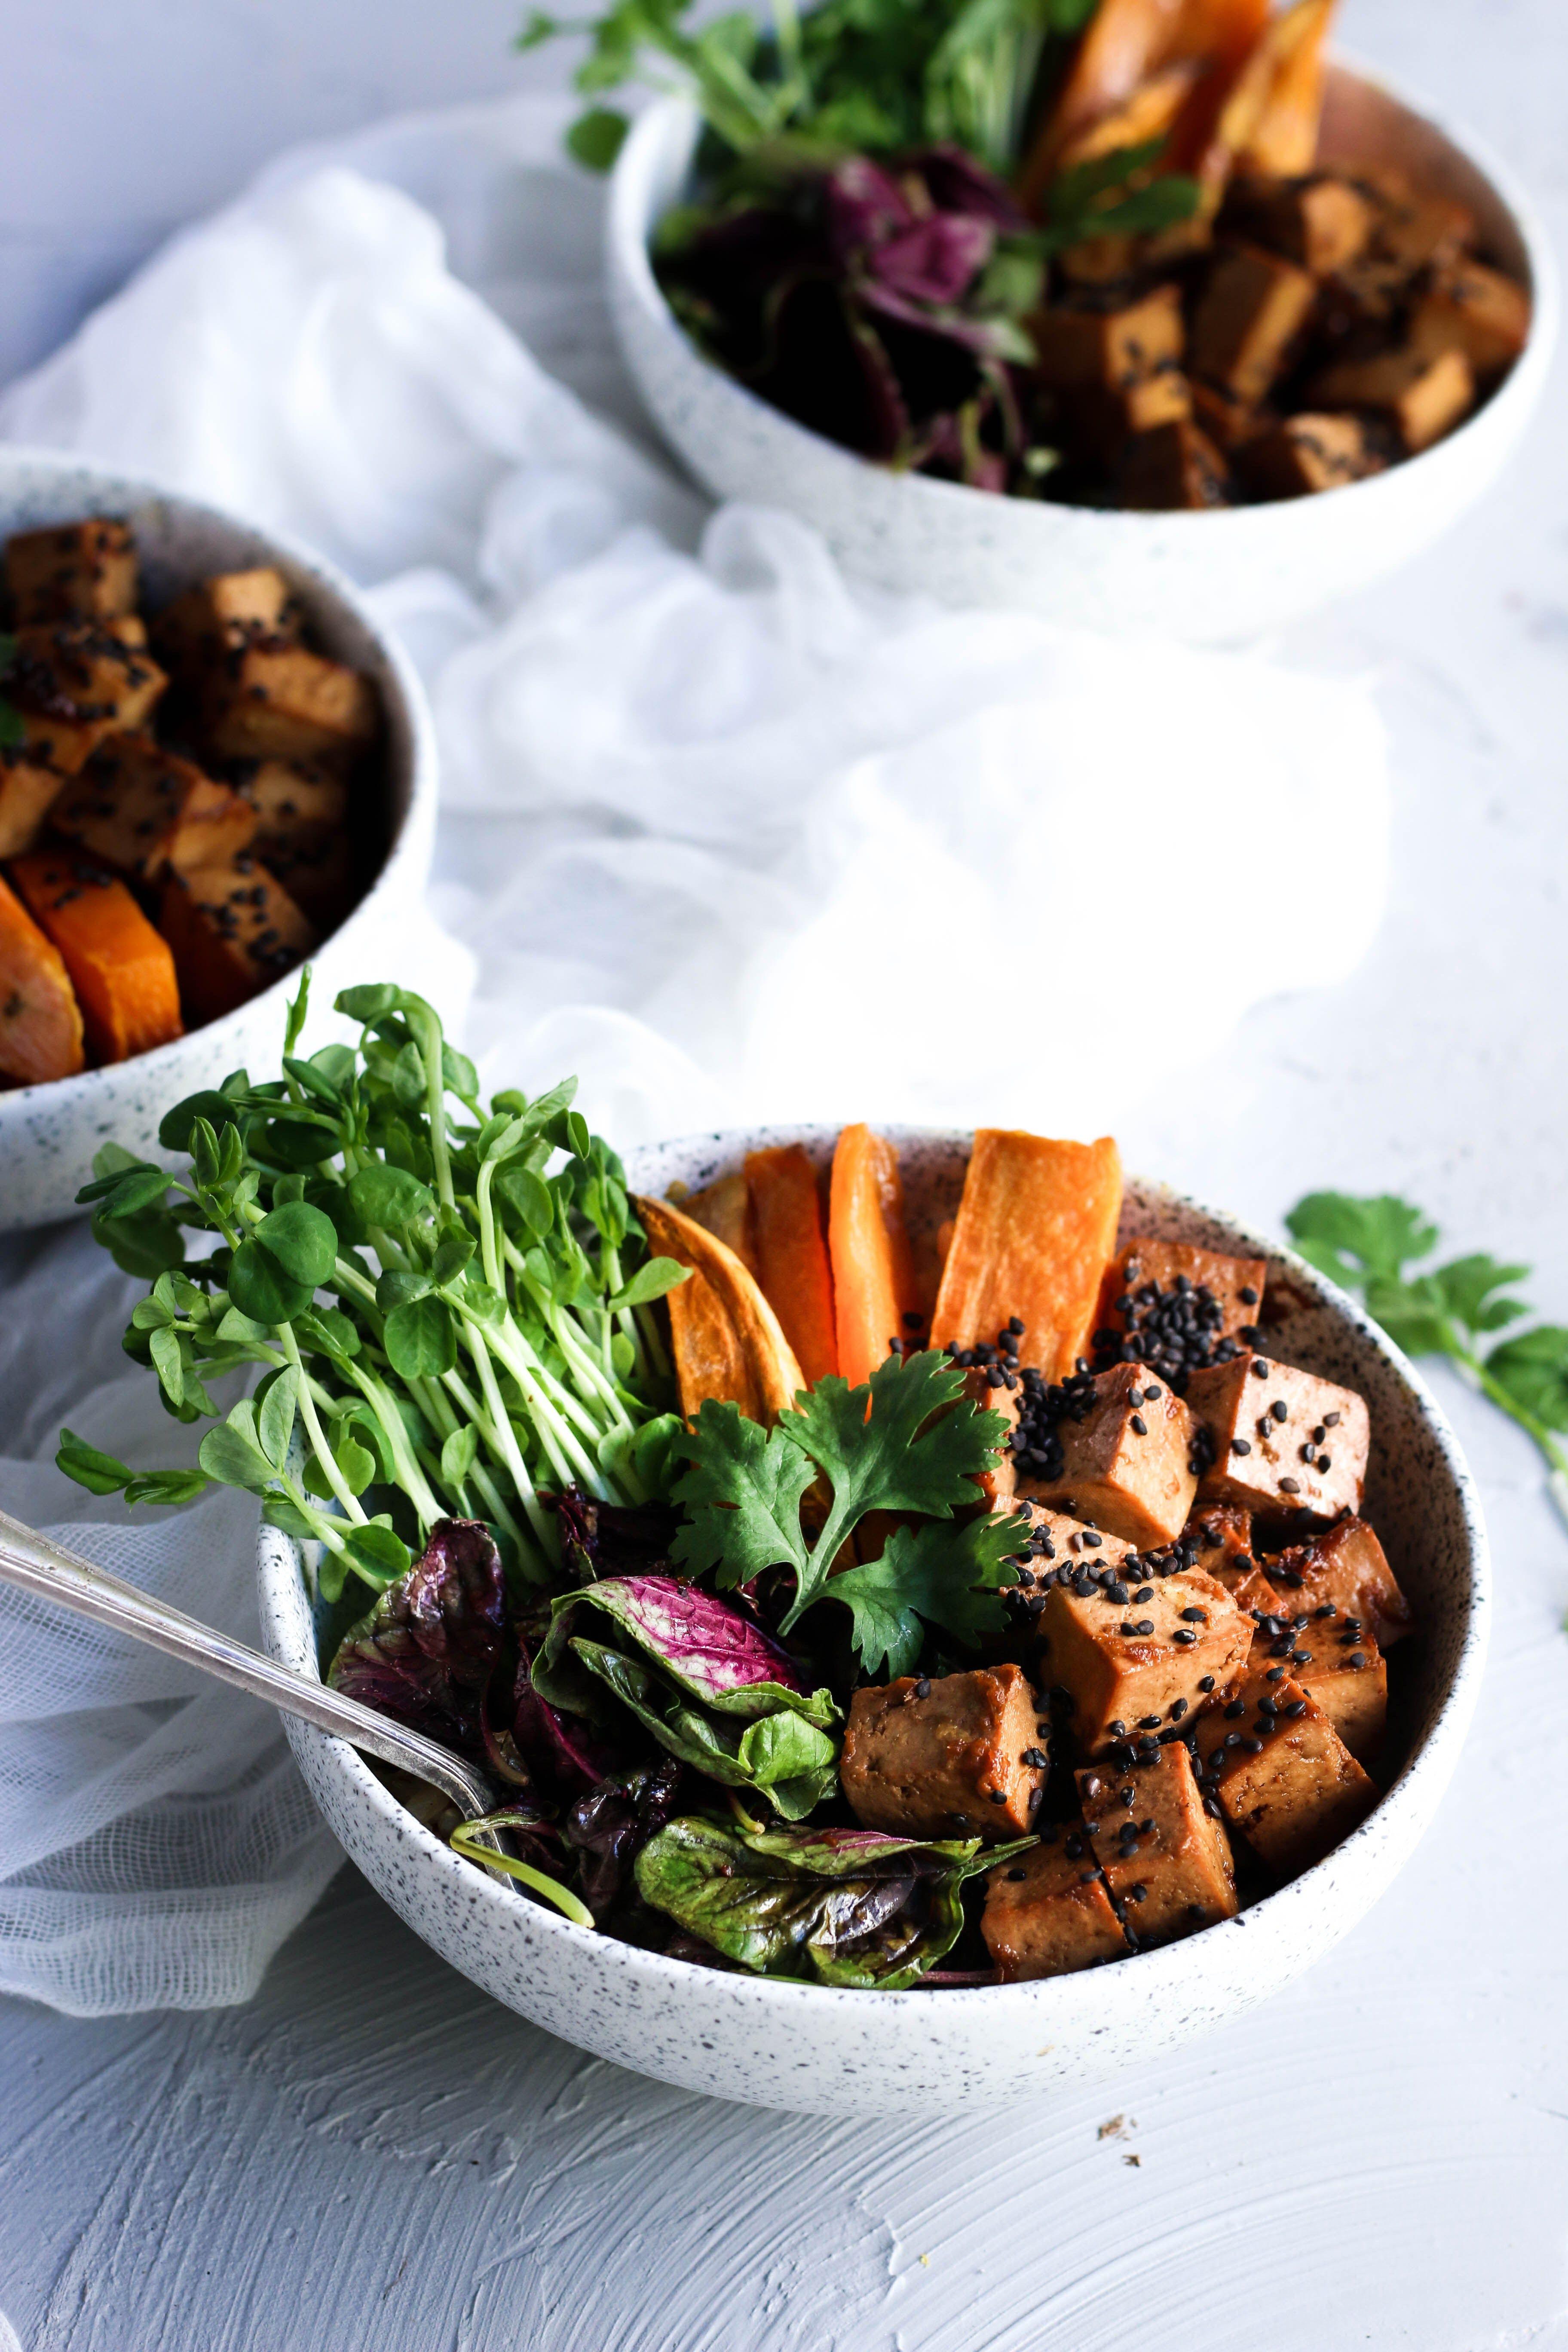 vegan recipes, asian flavours, asian recipe, plant foods, wholefood, gluten free recipe, dairy free recipe